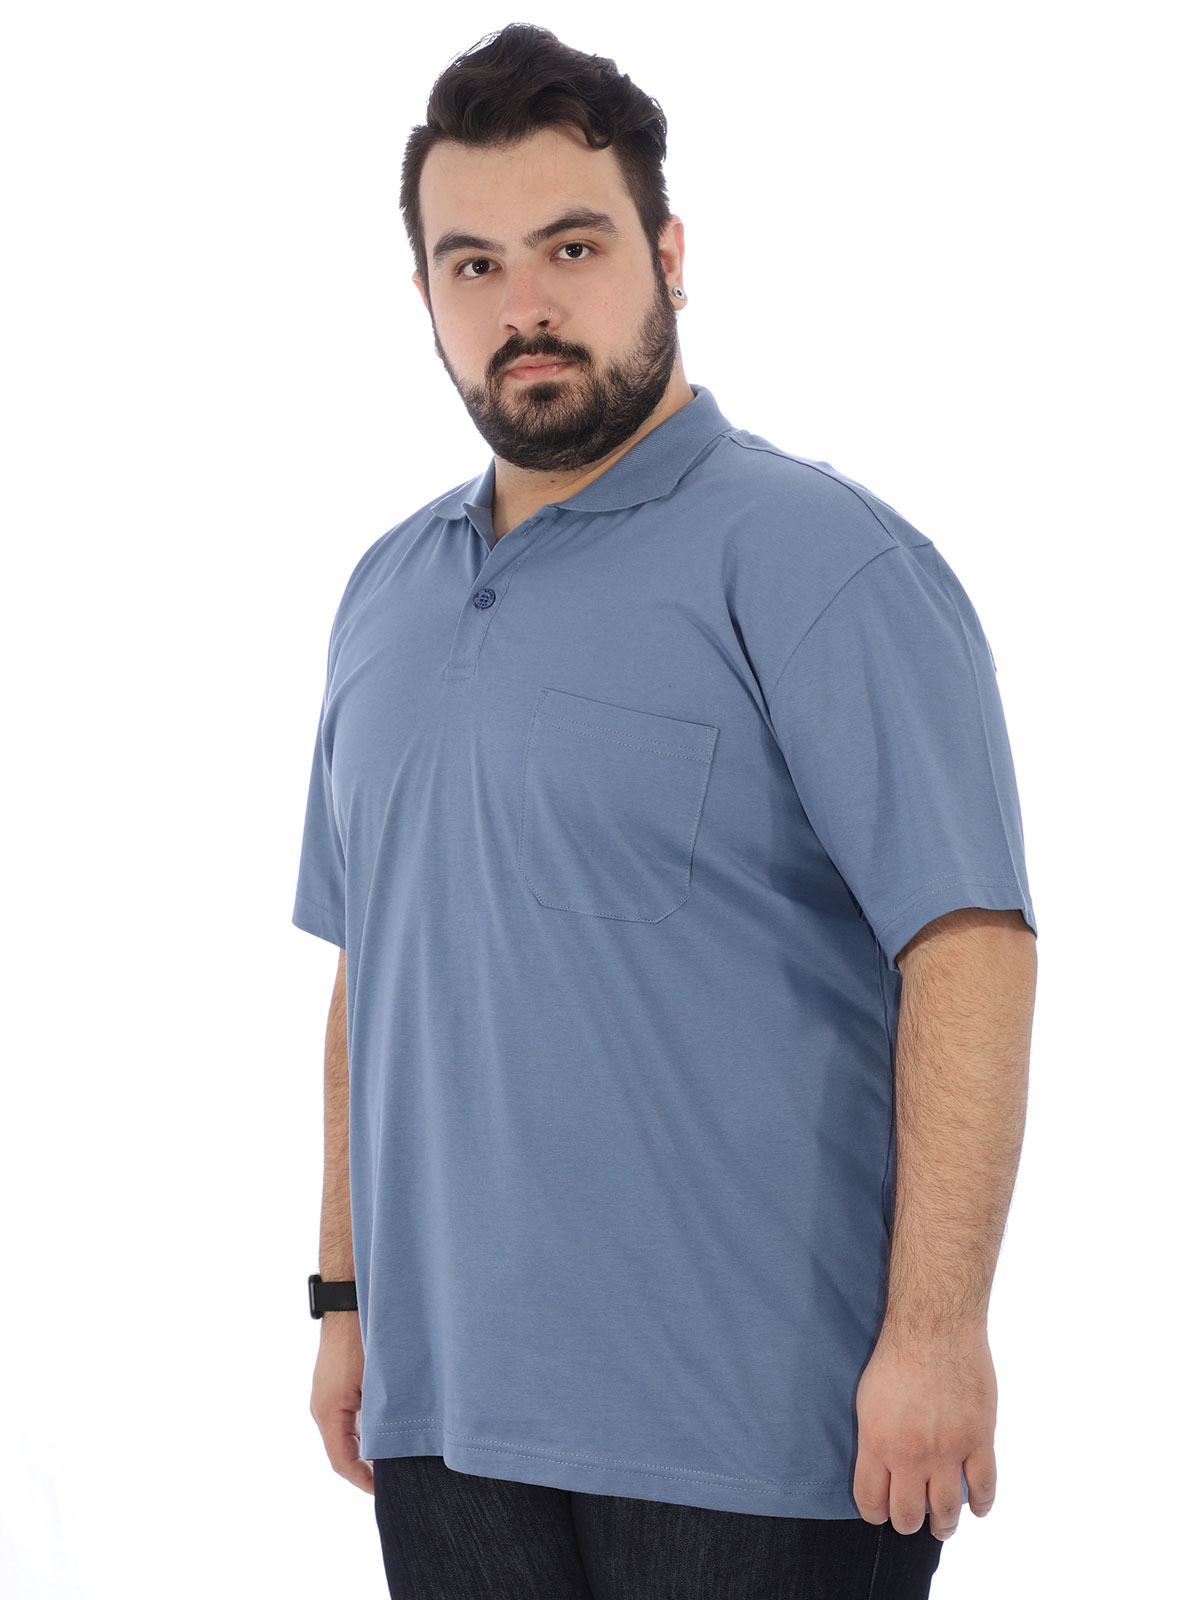 Camisa Polo Plus Size Masculina com Bolso Basica Indigo